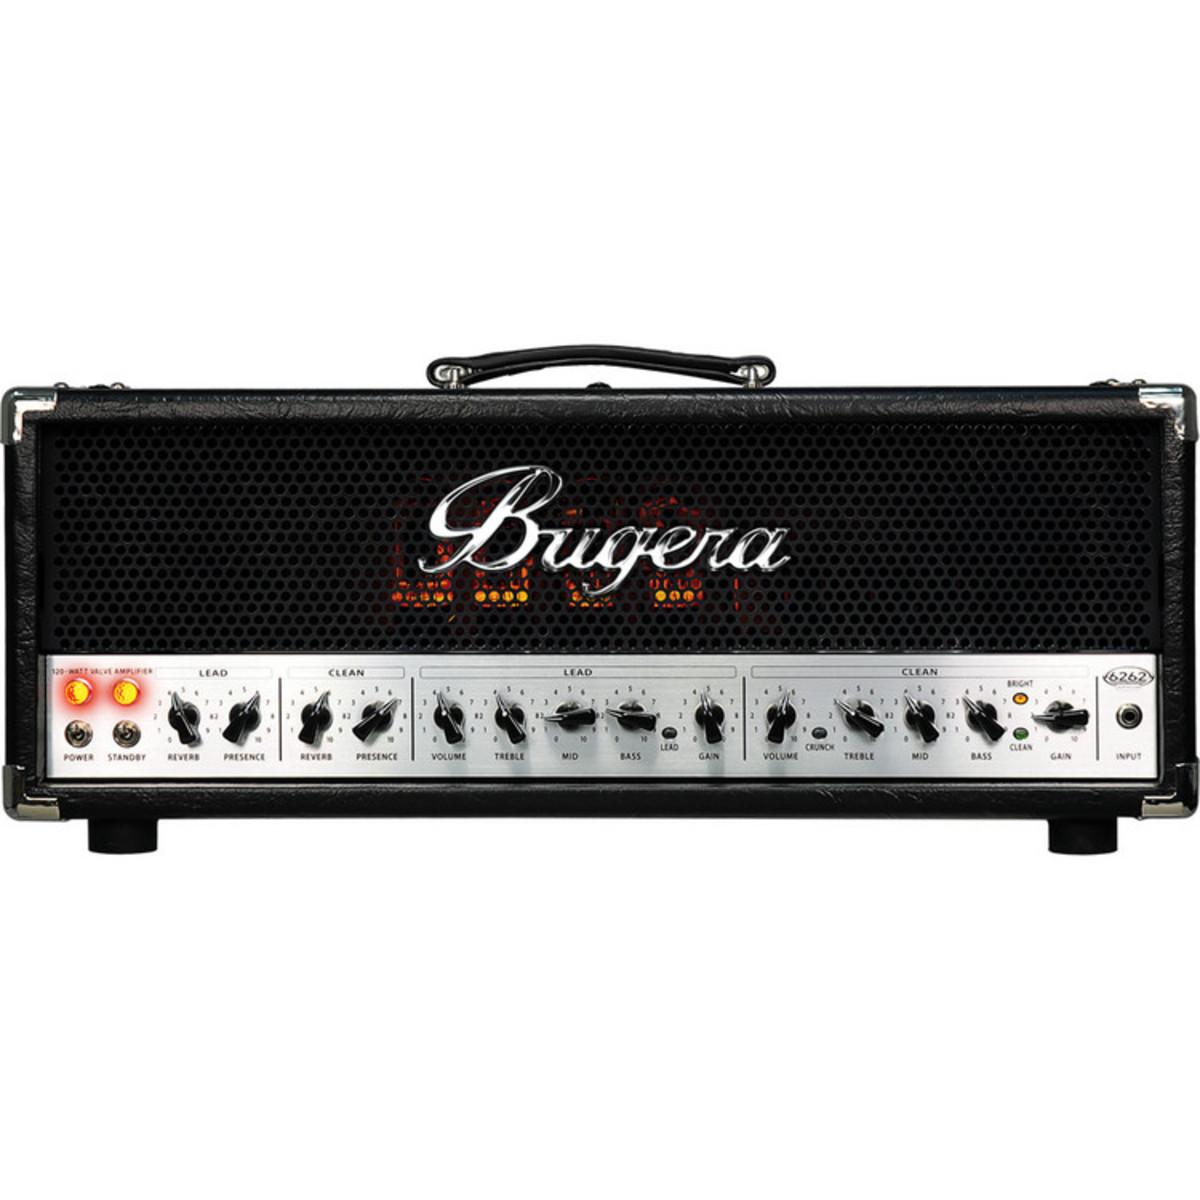 Bugera 6262 Infinium : bugera 6262 infinium 120 watt valve amp head b stock at gear4music ~ Hamham.info Haus und Dekorationen